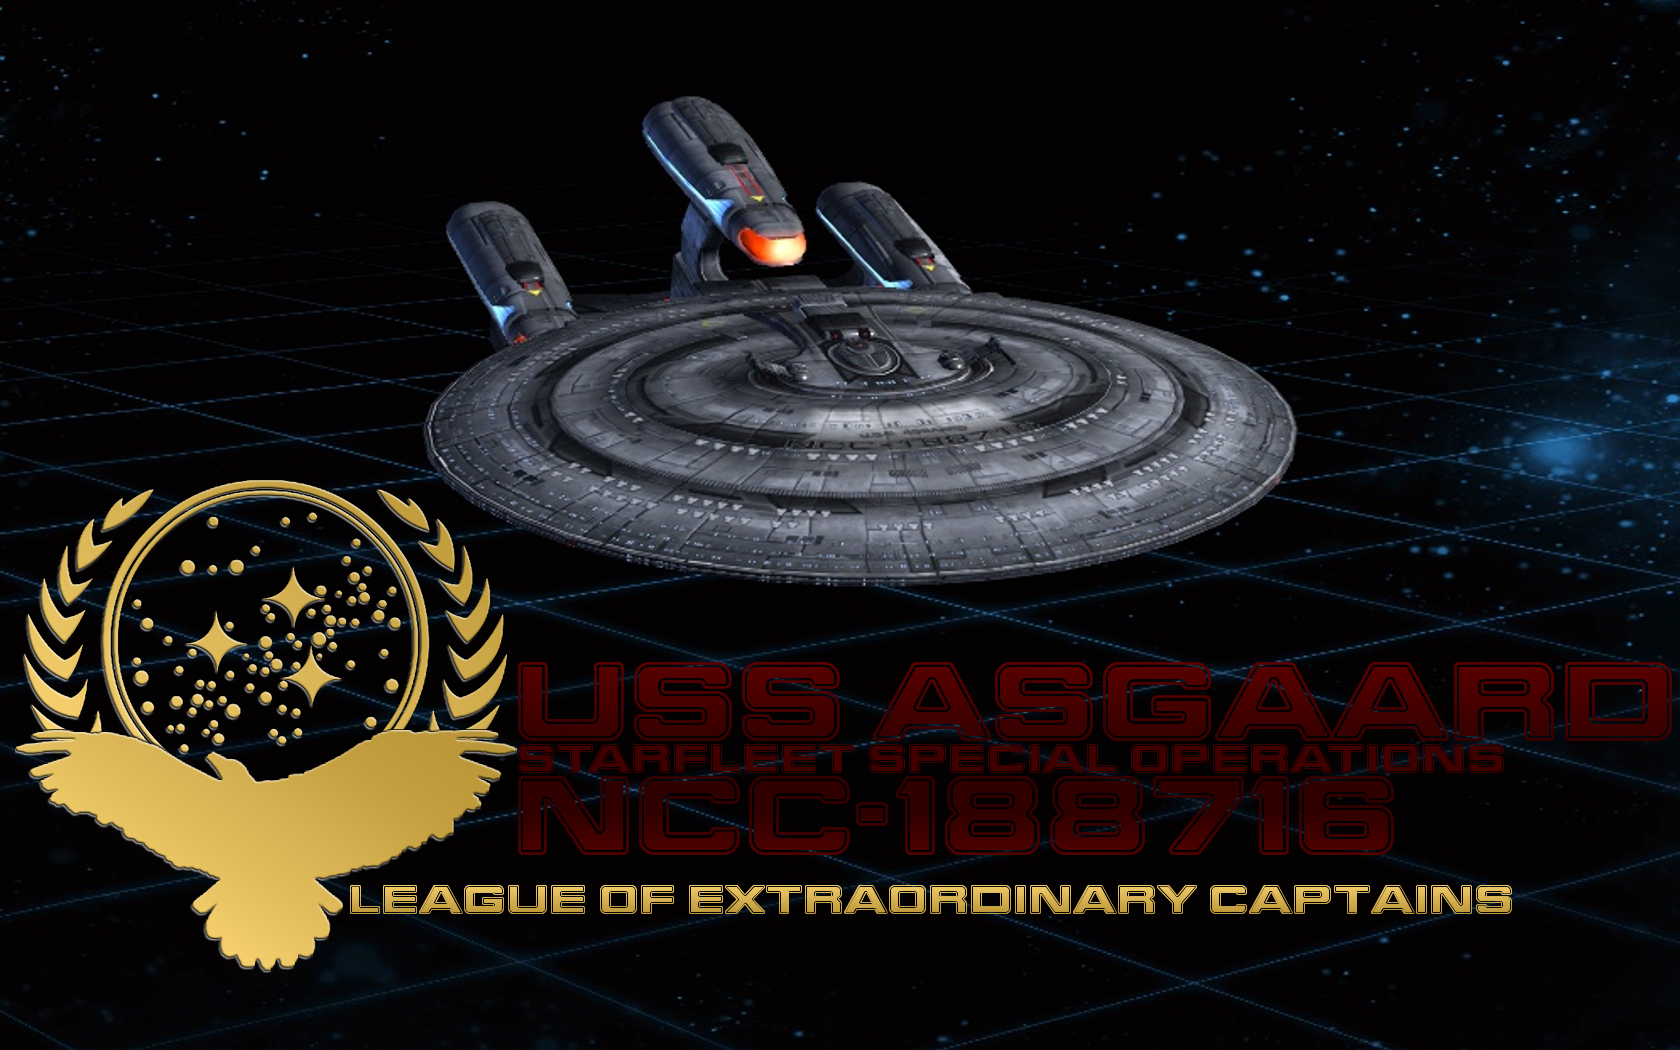 LOEC Wallpapers - USS Asgaard by kevmascolcha